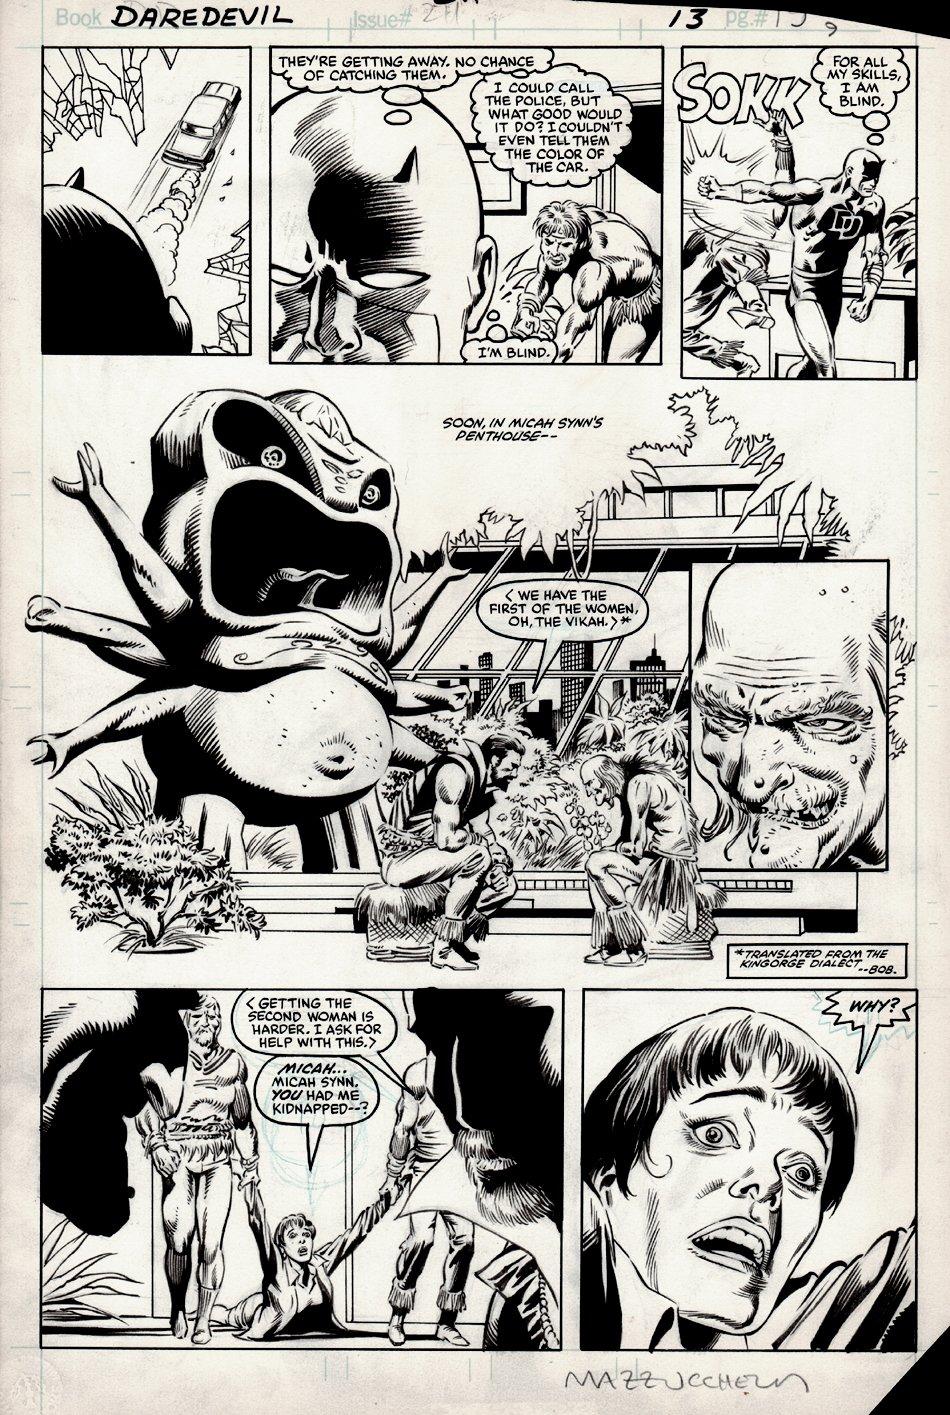 Daredevil #211 p 13 (CLASSIC STORY) 1984